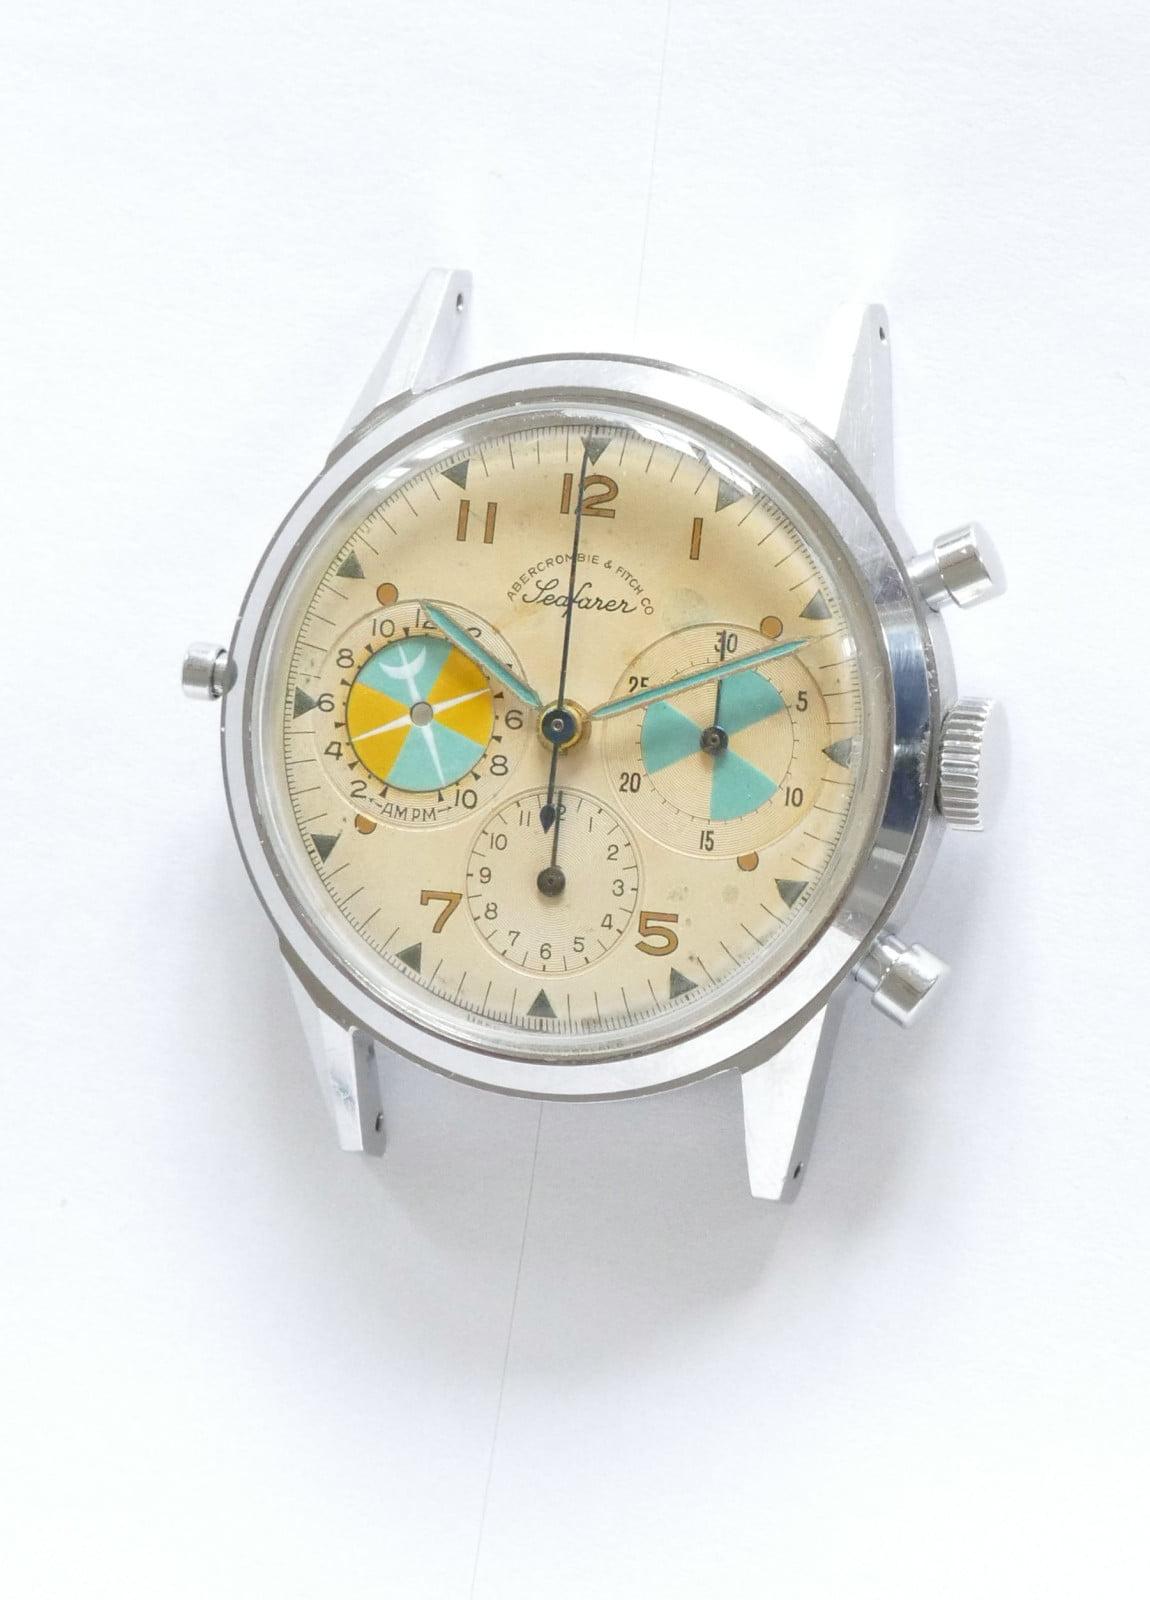 Abercrombie & Fitch Seafarer 2443